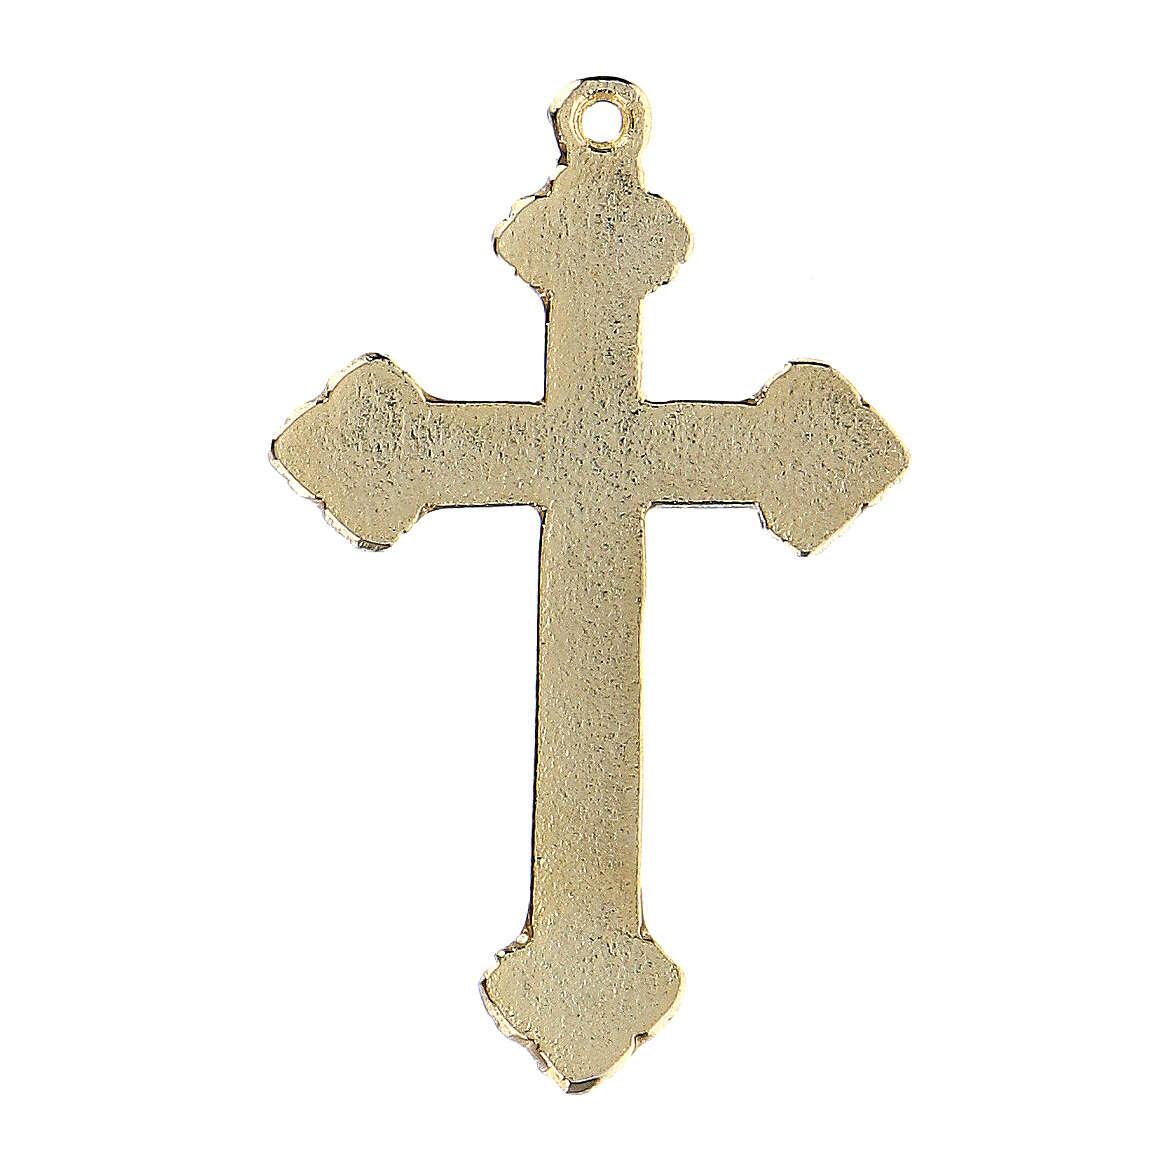 Crucifix pendant with green enamel paint 4